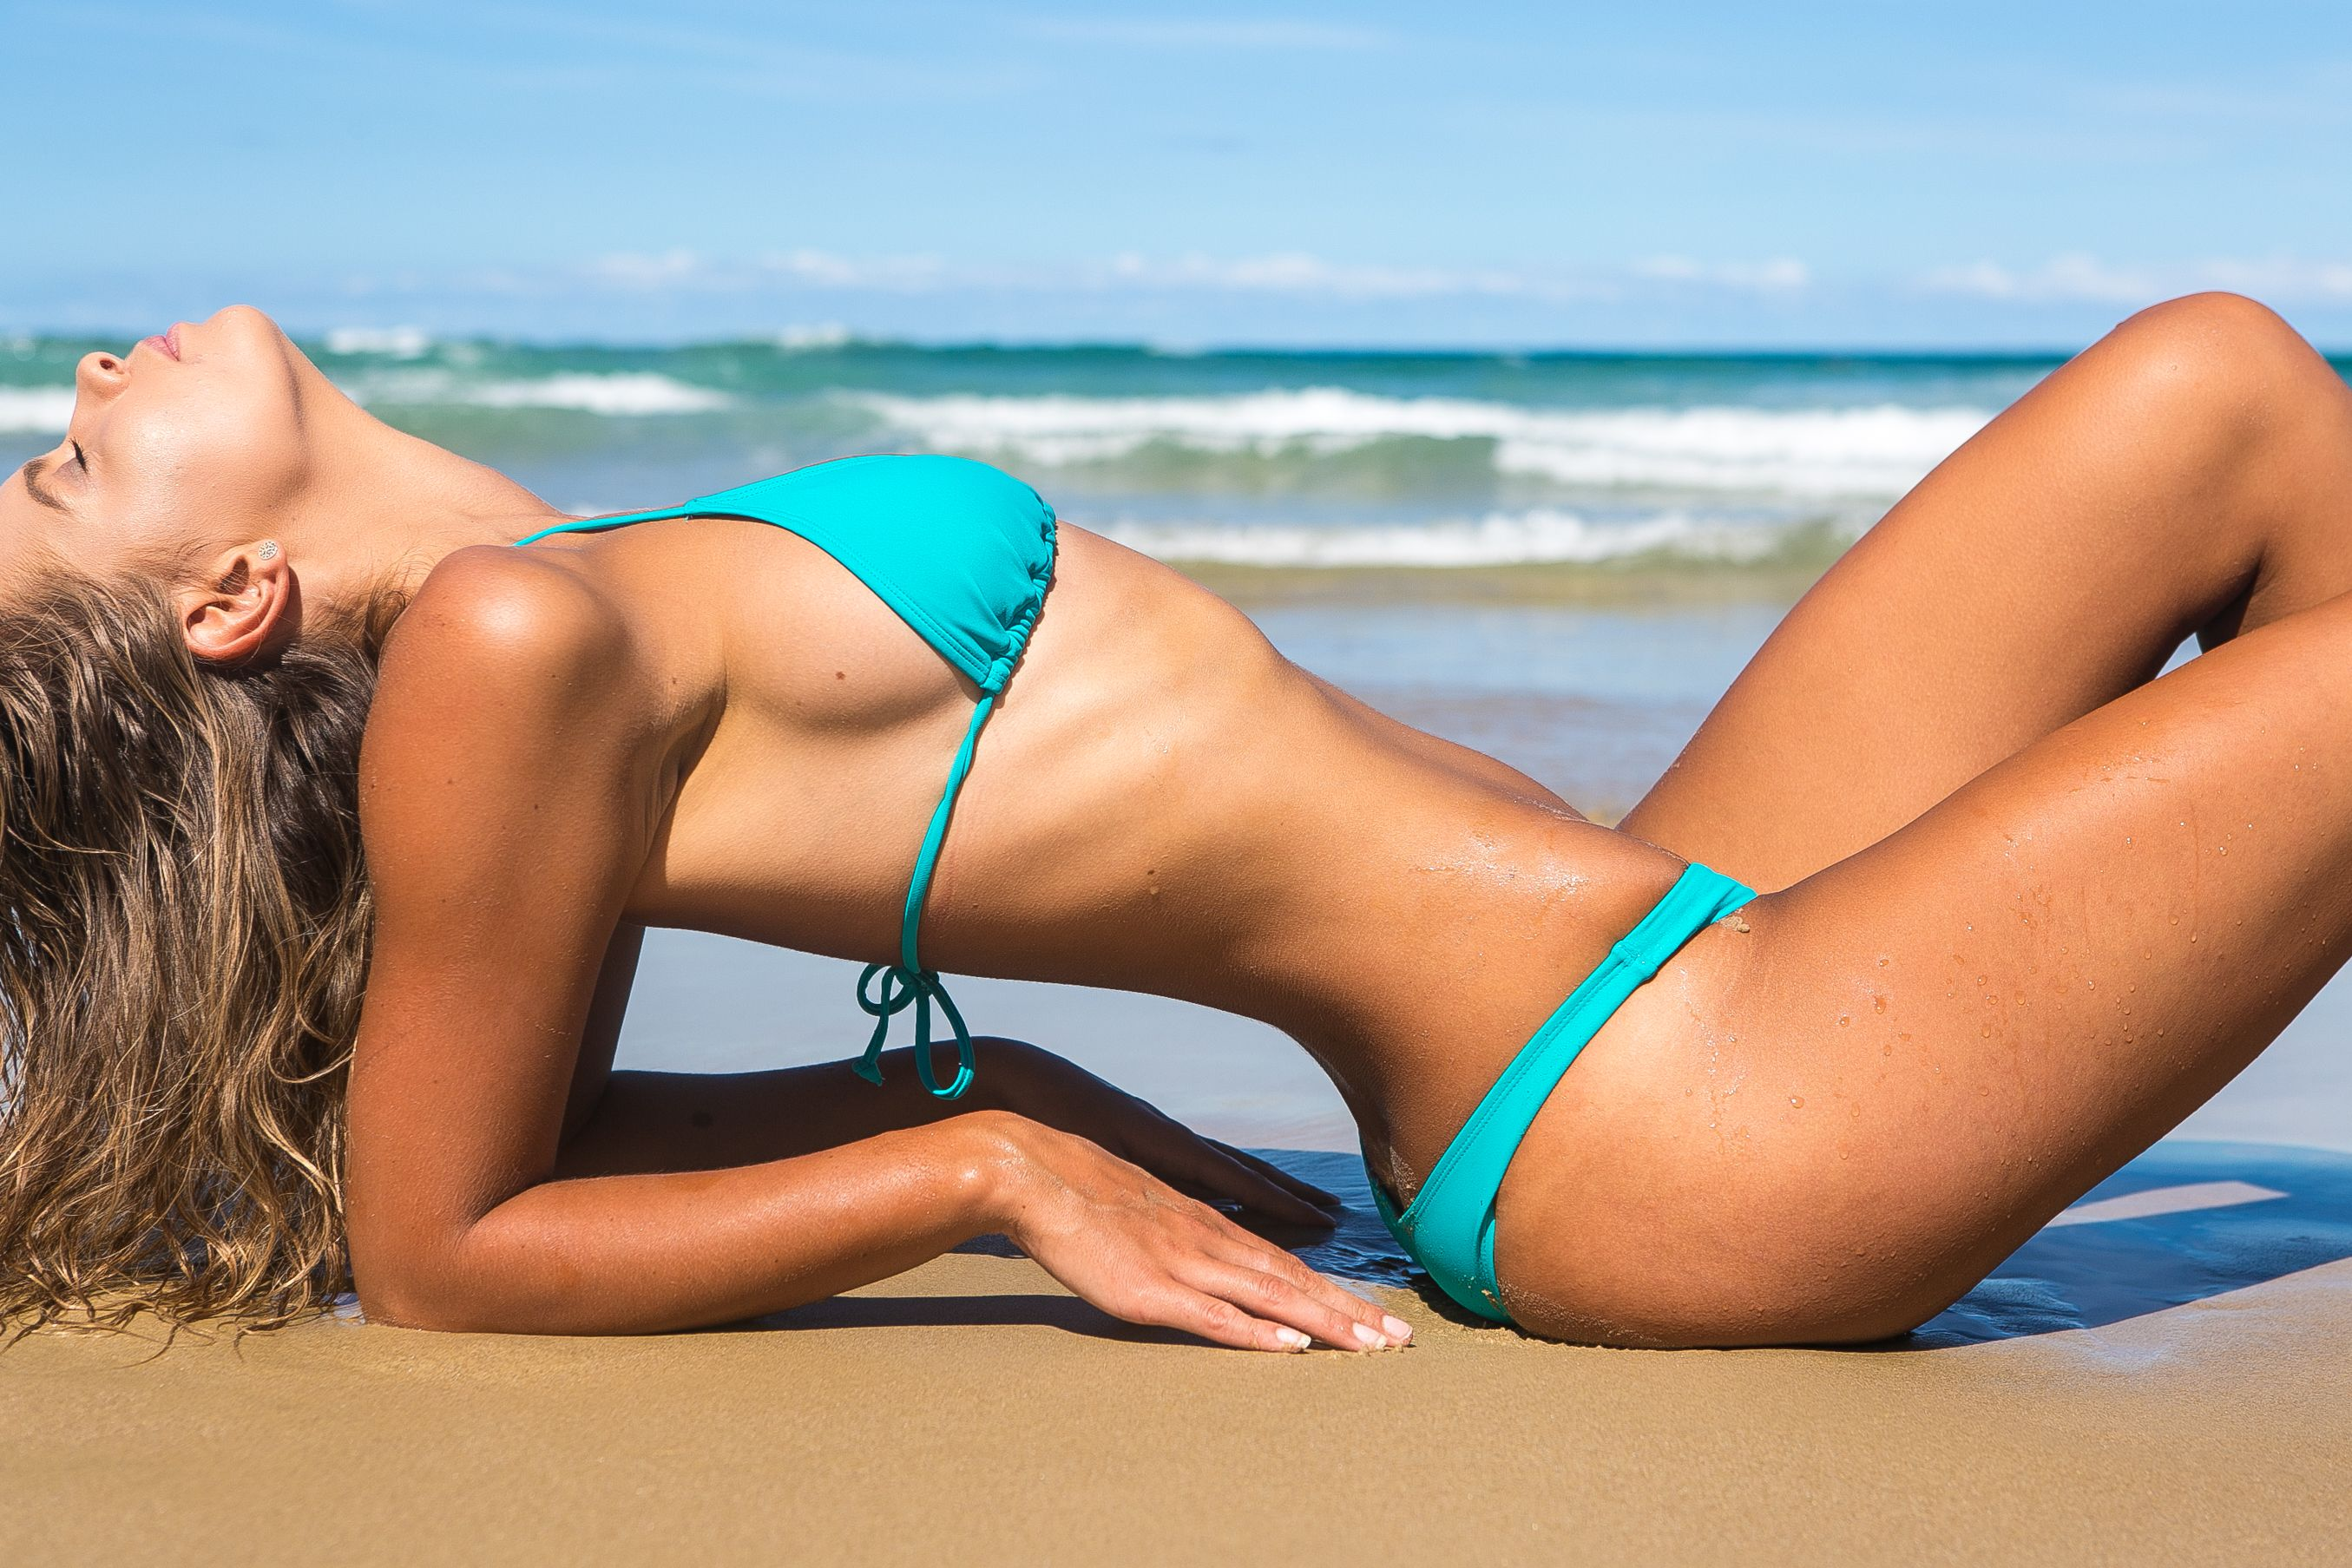 Cleavage Kristina Mendonca naked (88 foto and video), Ass, Bikini, Twitter, in bikini 2020